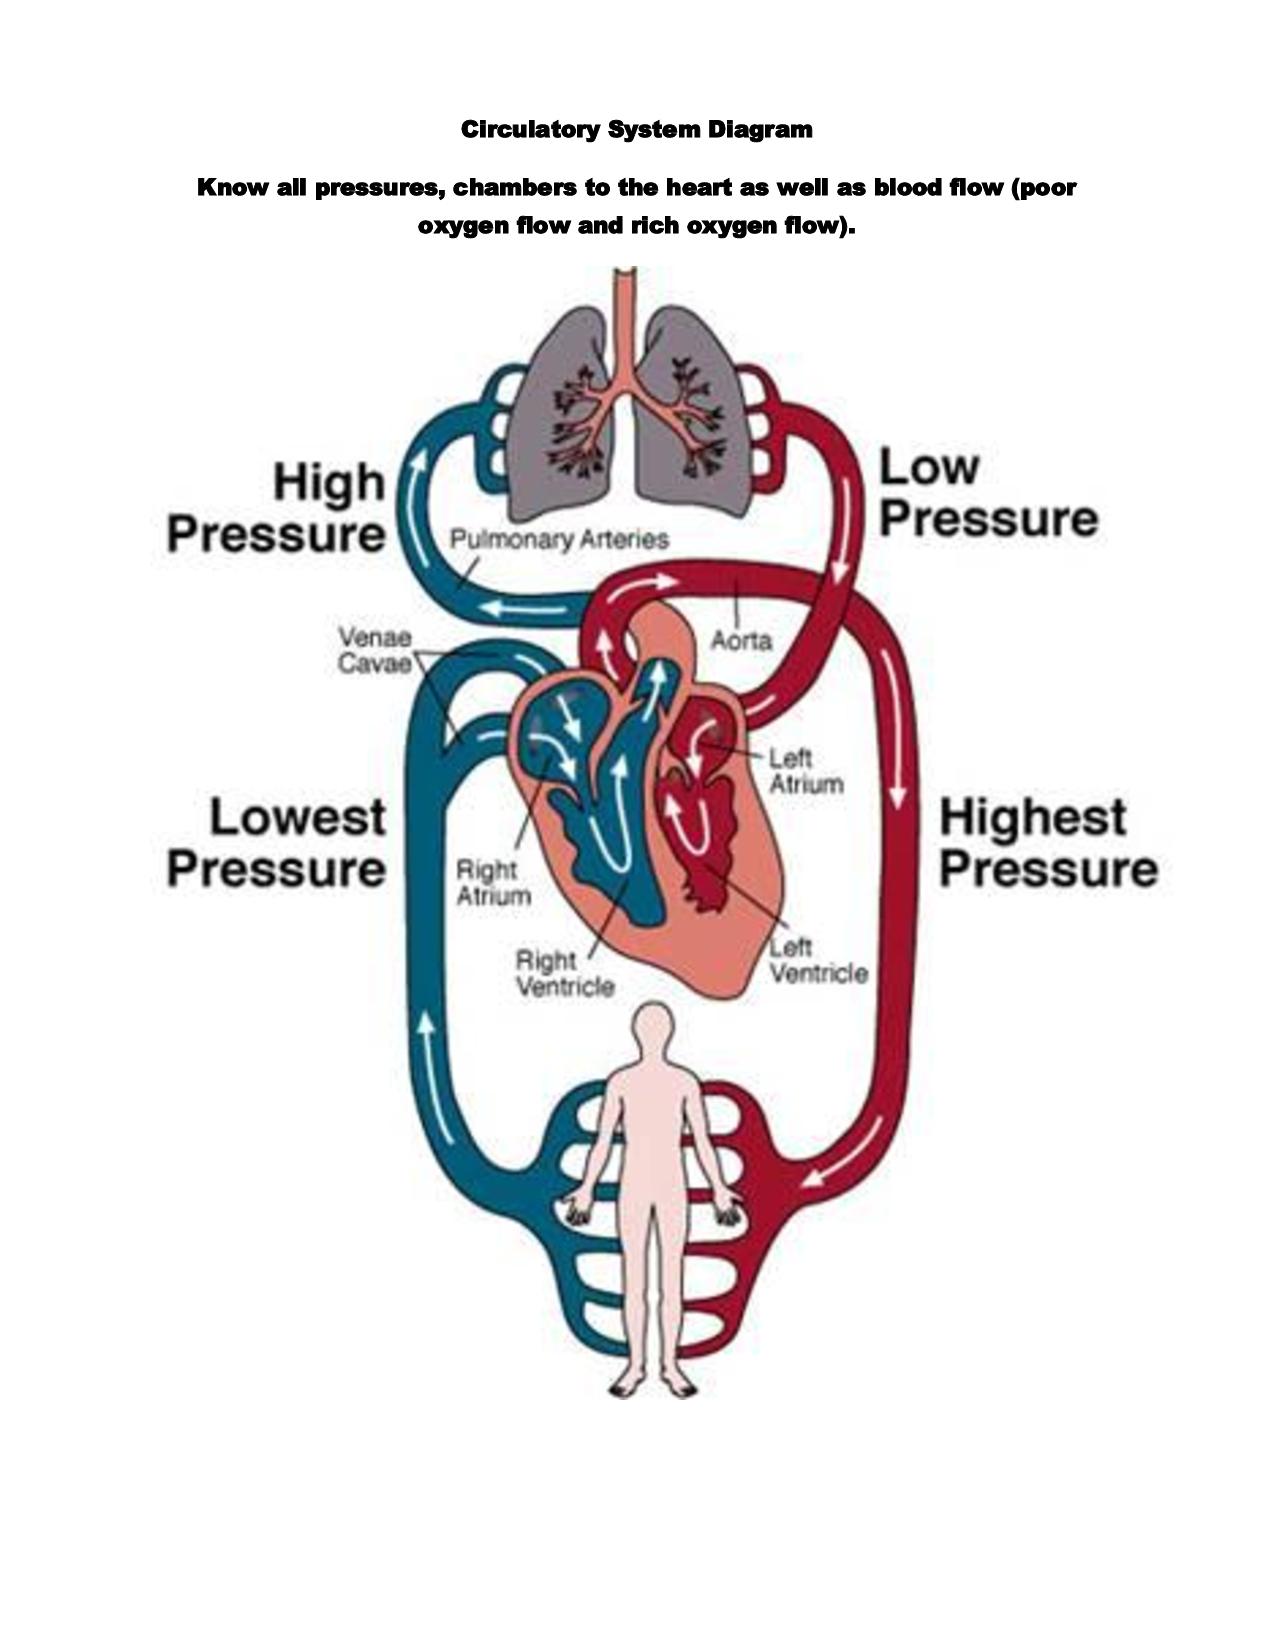 Circulatory System Through External Respirtaion A Gas Exchange Occurs Betweem Pulmonary Blood